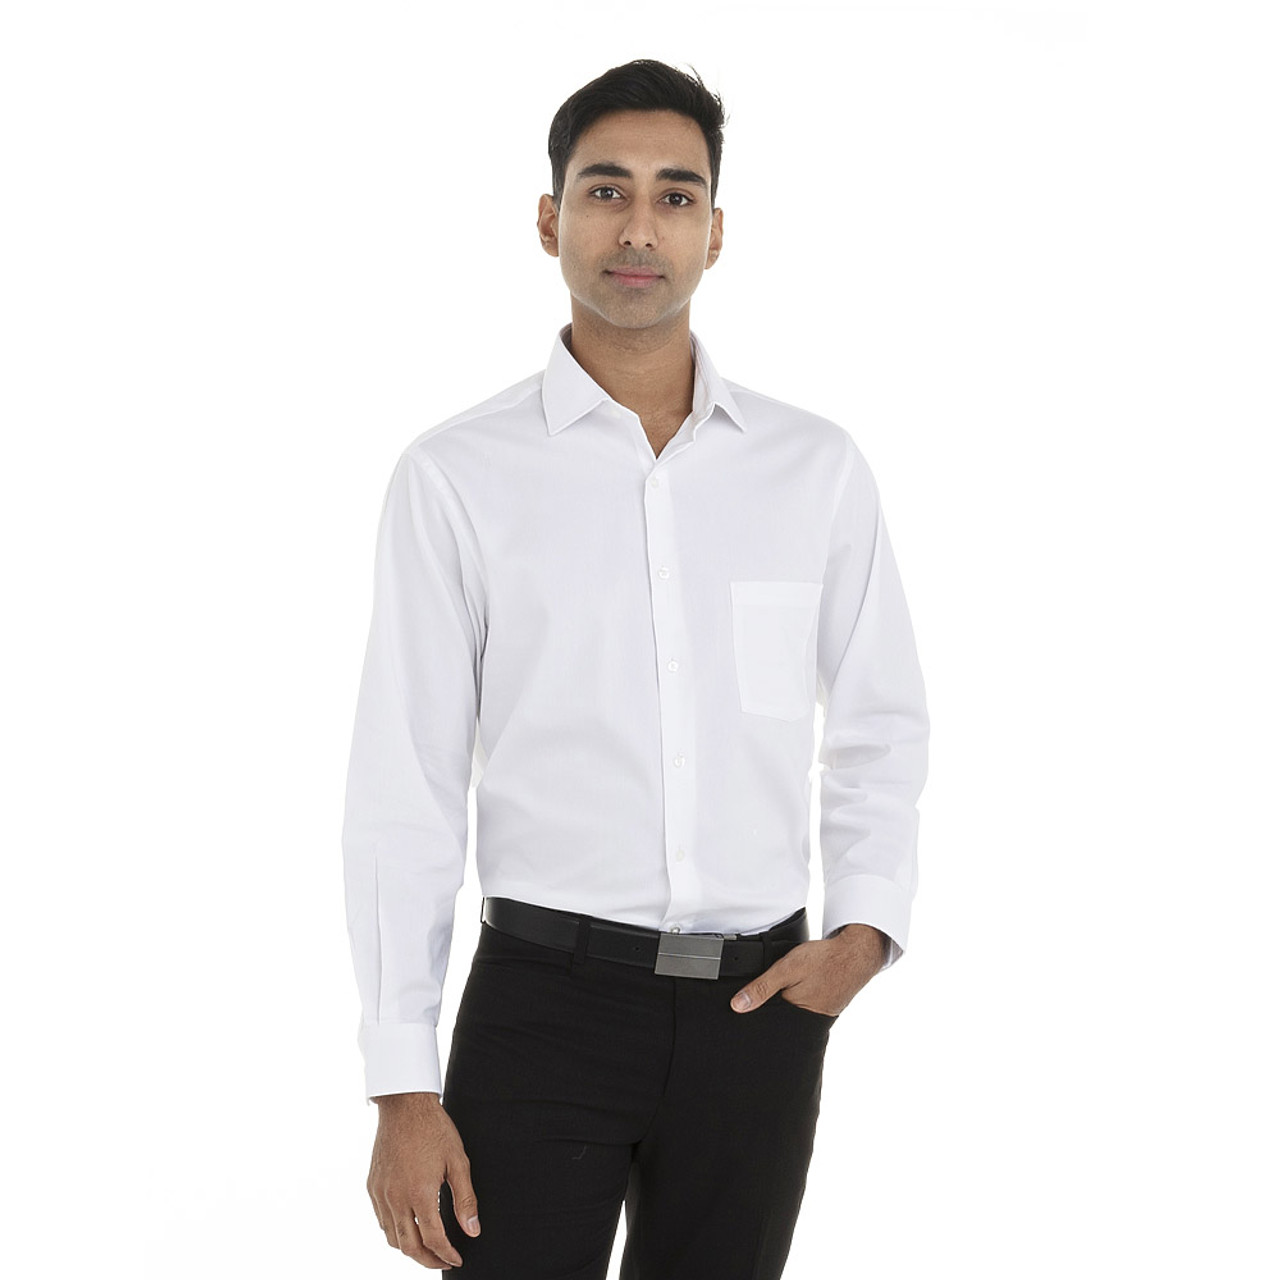 White - 18CV315 Van Heusen Long Sleeve Flex Stretch Shirt | T-shirt.ca